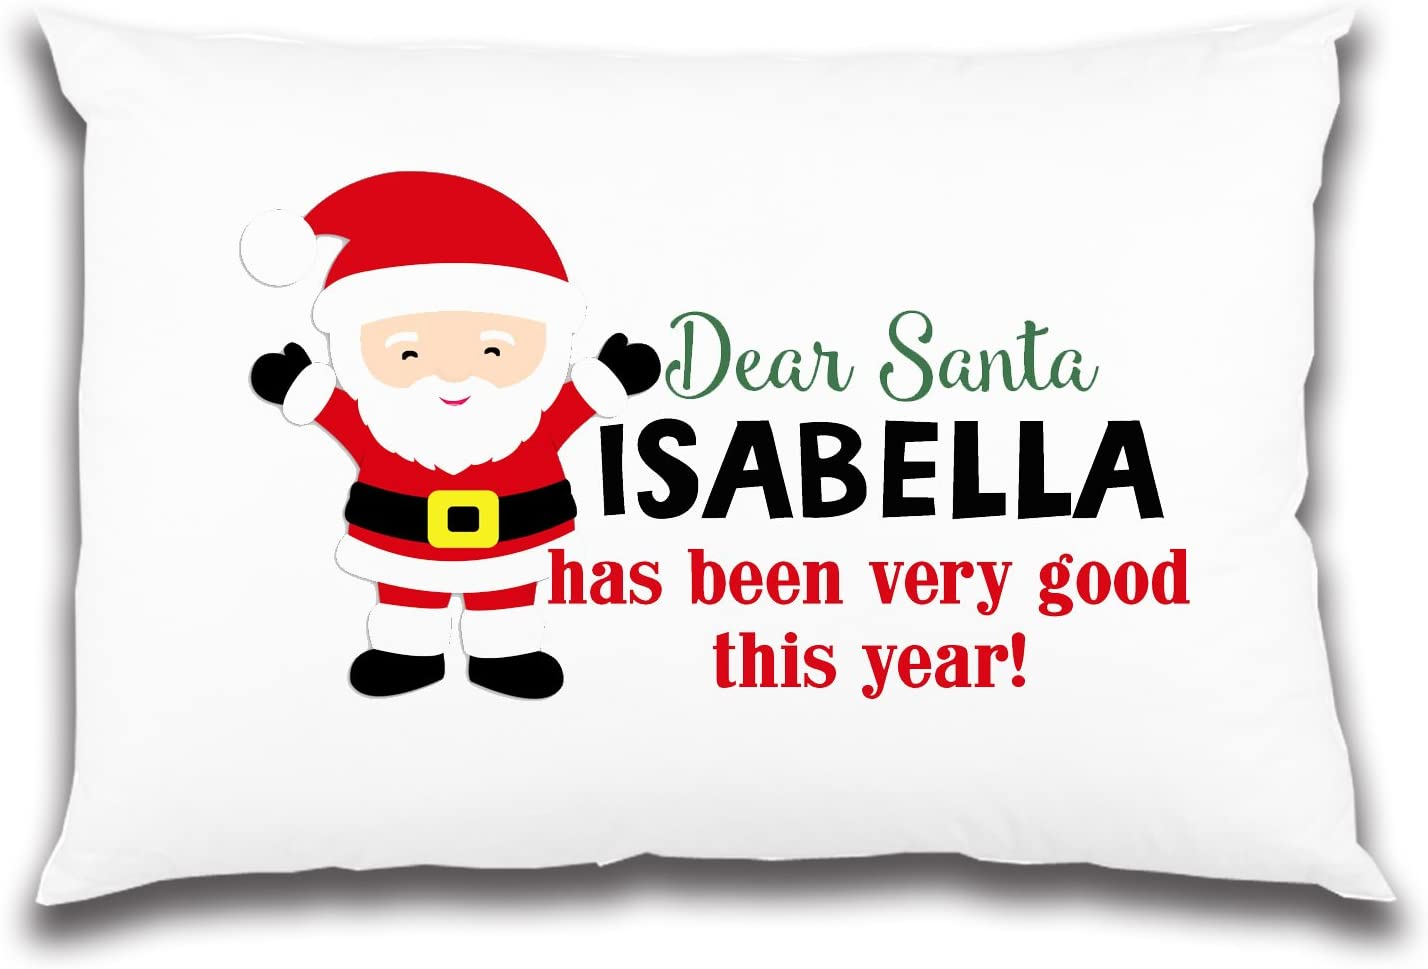 Santa personalised pillowcase great Christmas Eve gift idea